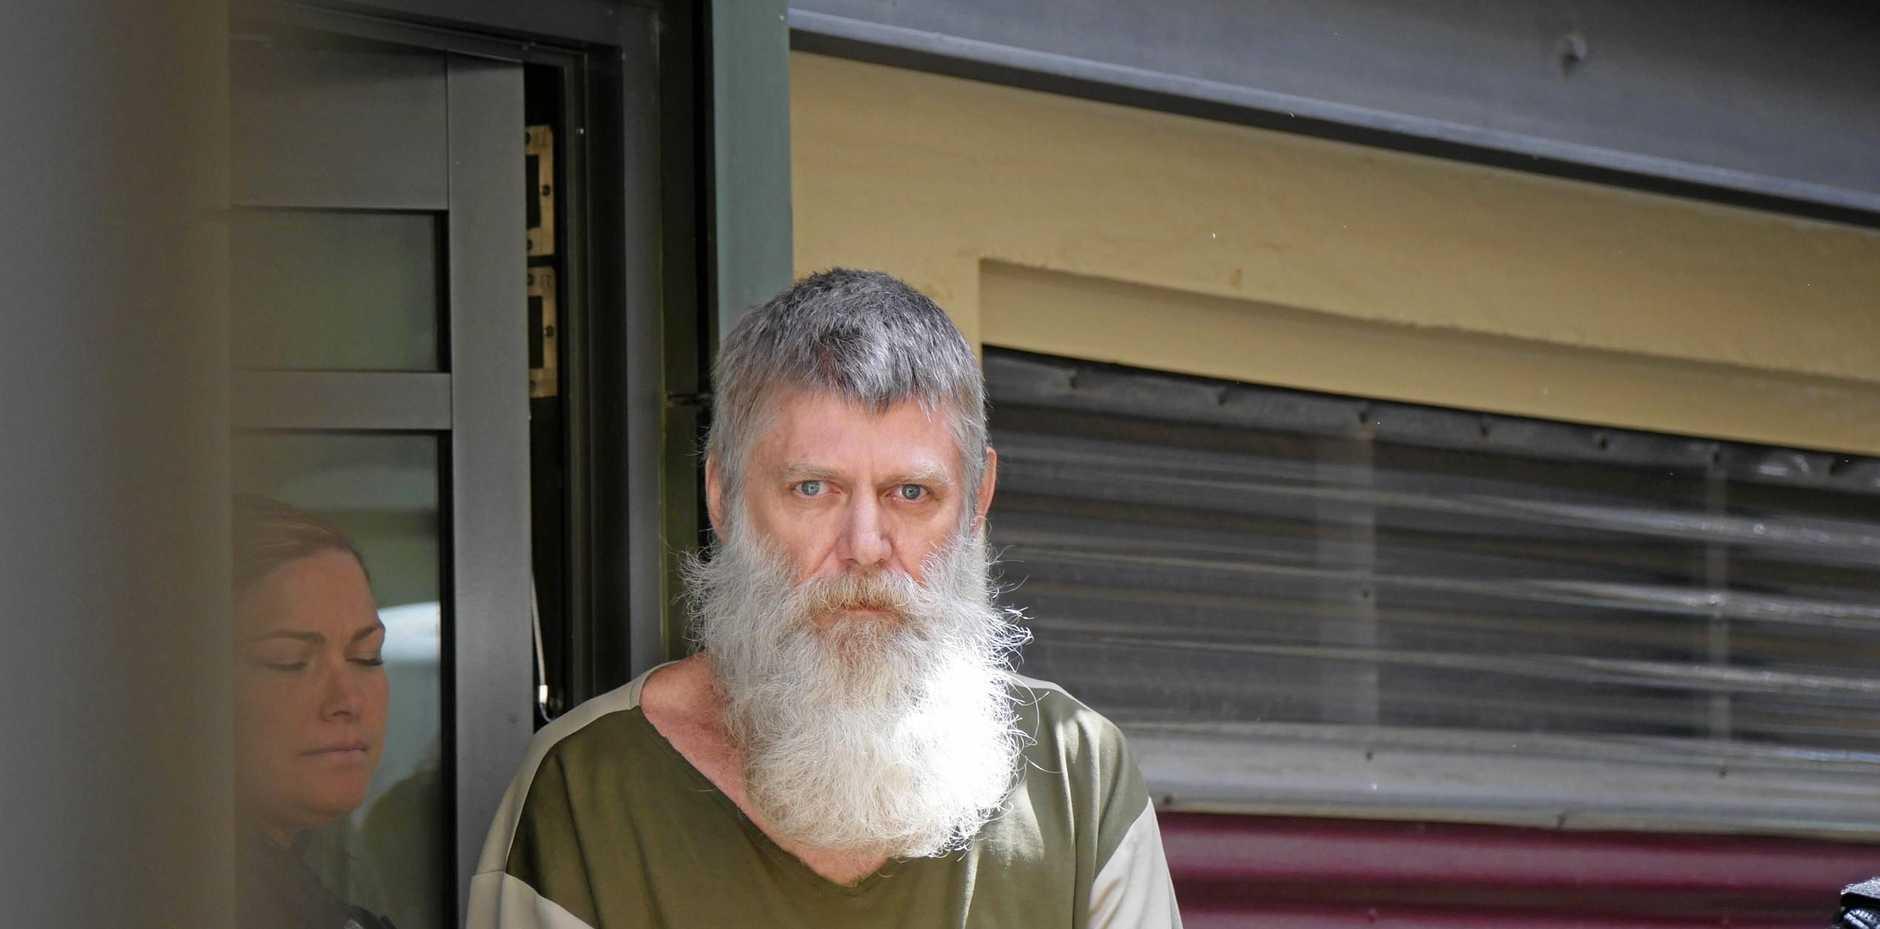 Lock Desmond Richter, 54, leaves Maryborough Magistrates Court after sentencing.